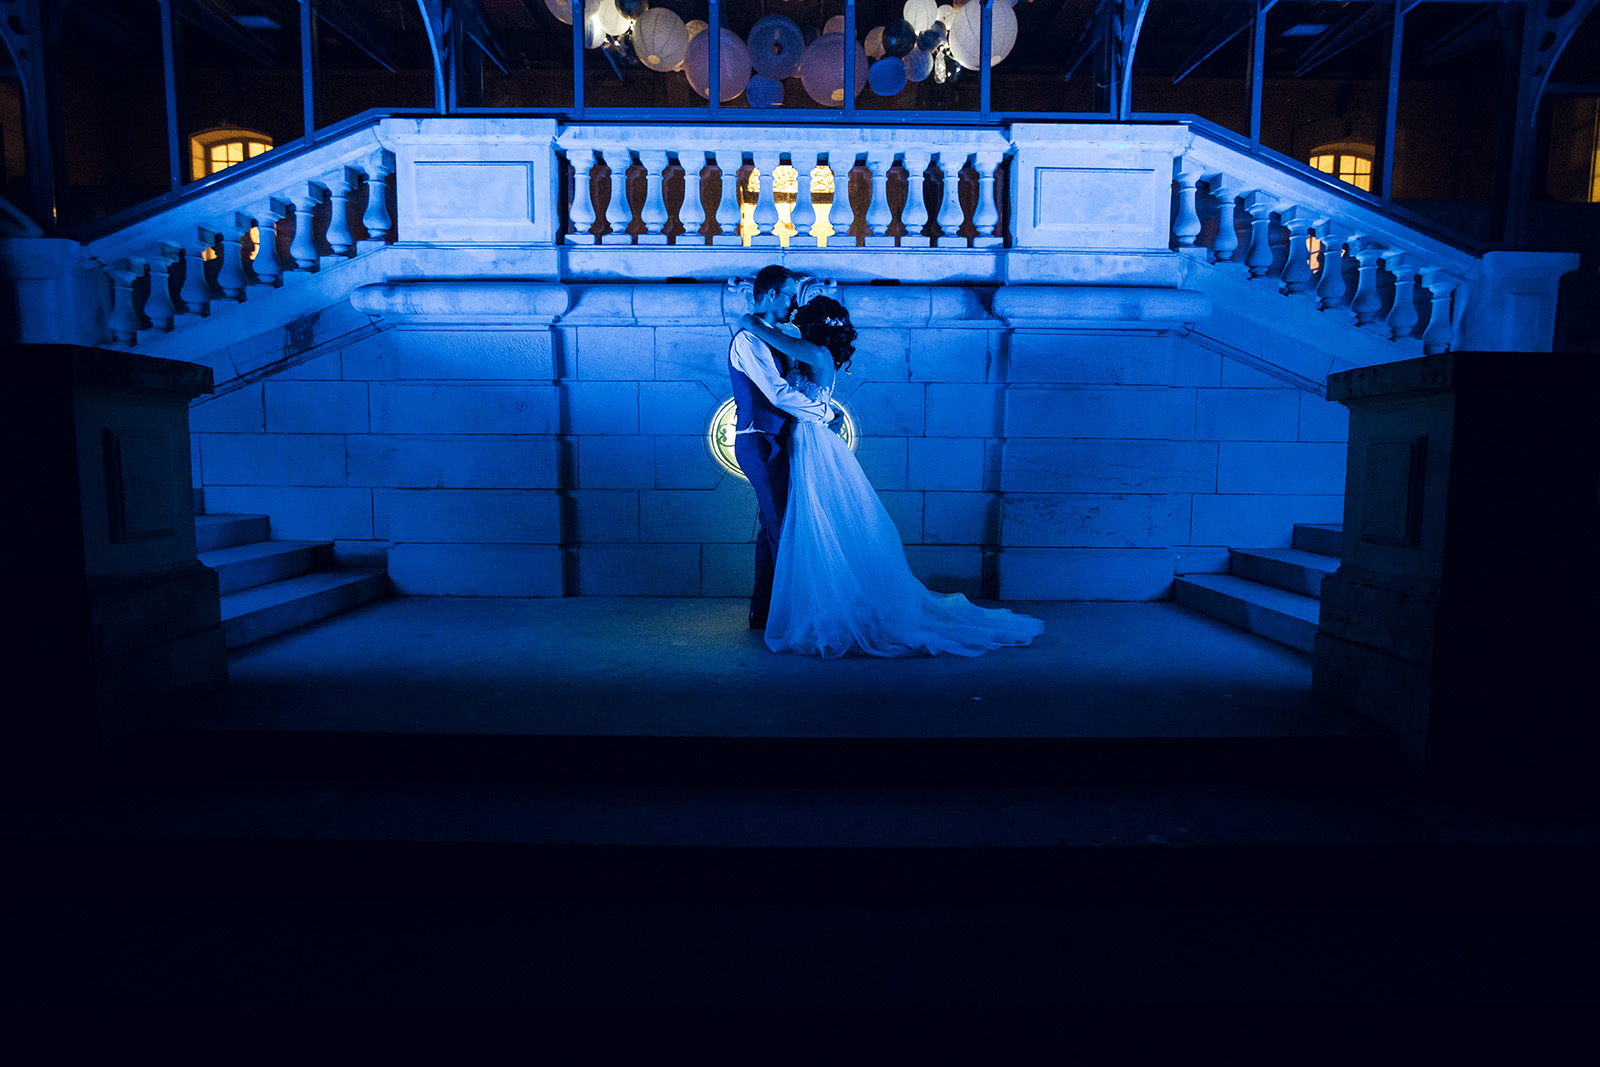 photographe-mariage-reportage-wedding-photographer-charly-lyon-auvergne-rhone-alpes-soiree-reception-chateau-de-rajat-photo-de-couple-love-session-amour